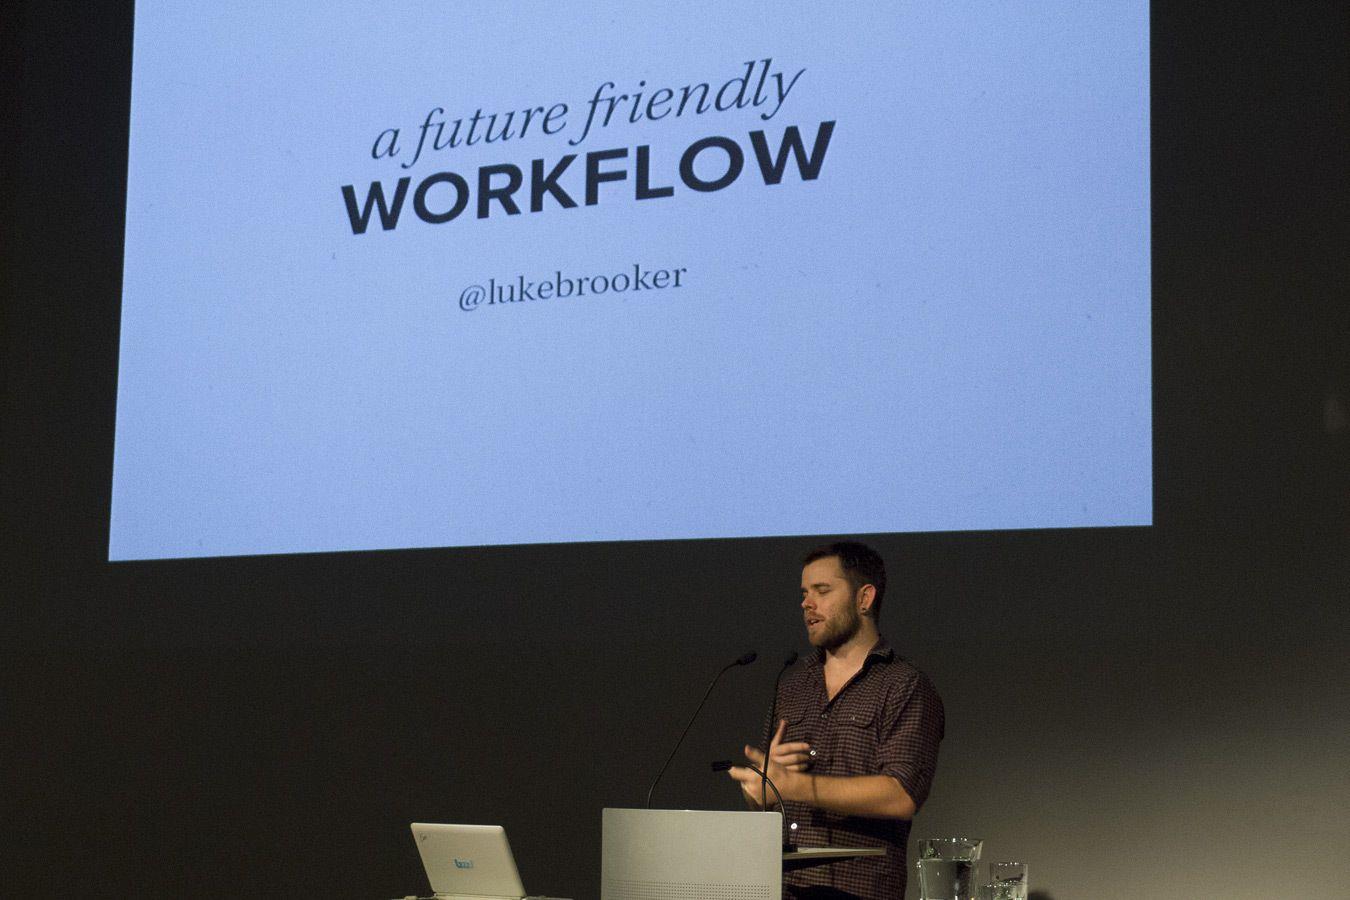 The Brisbane Web Design Meetup Group